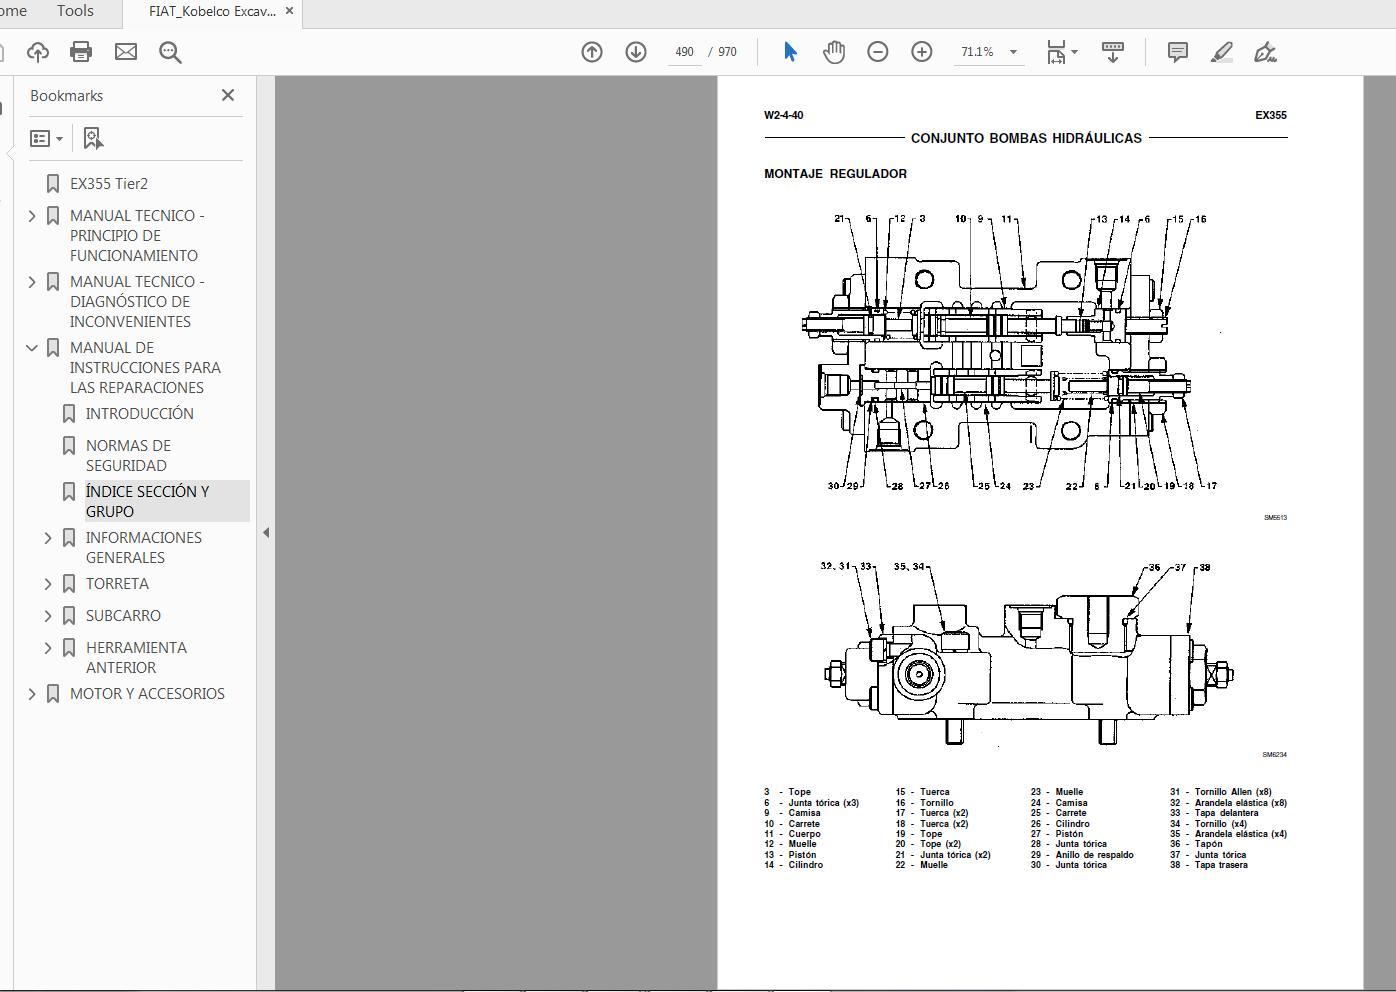 FIATKobelco_Excavator_EX355_Tier2_60413209_Service_Repair_Manual_5